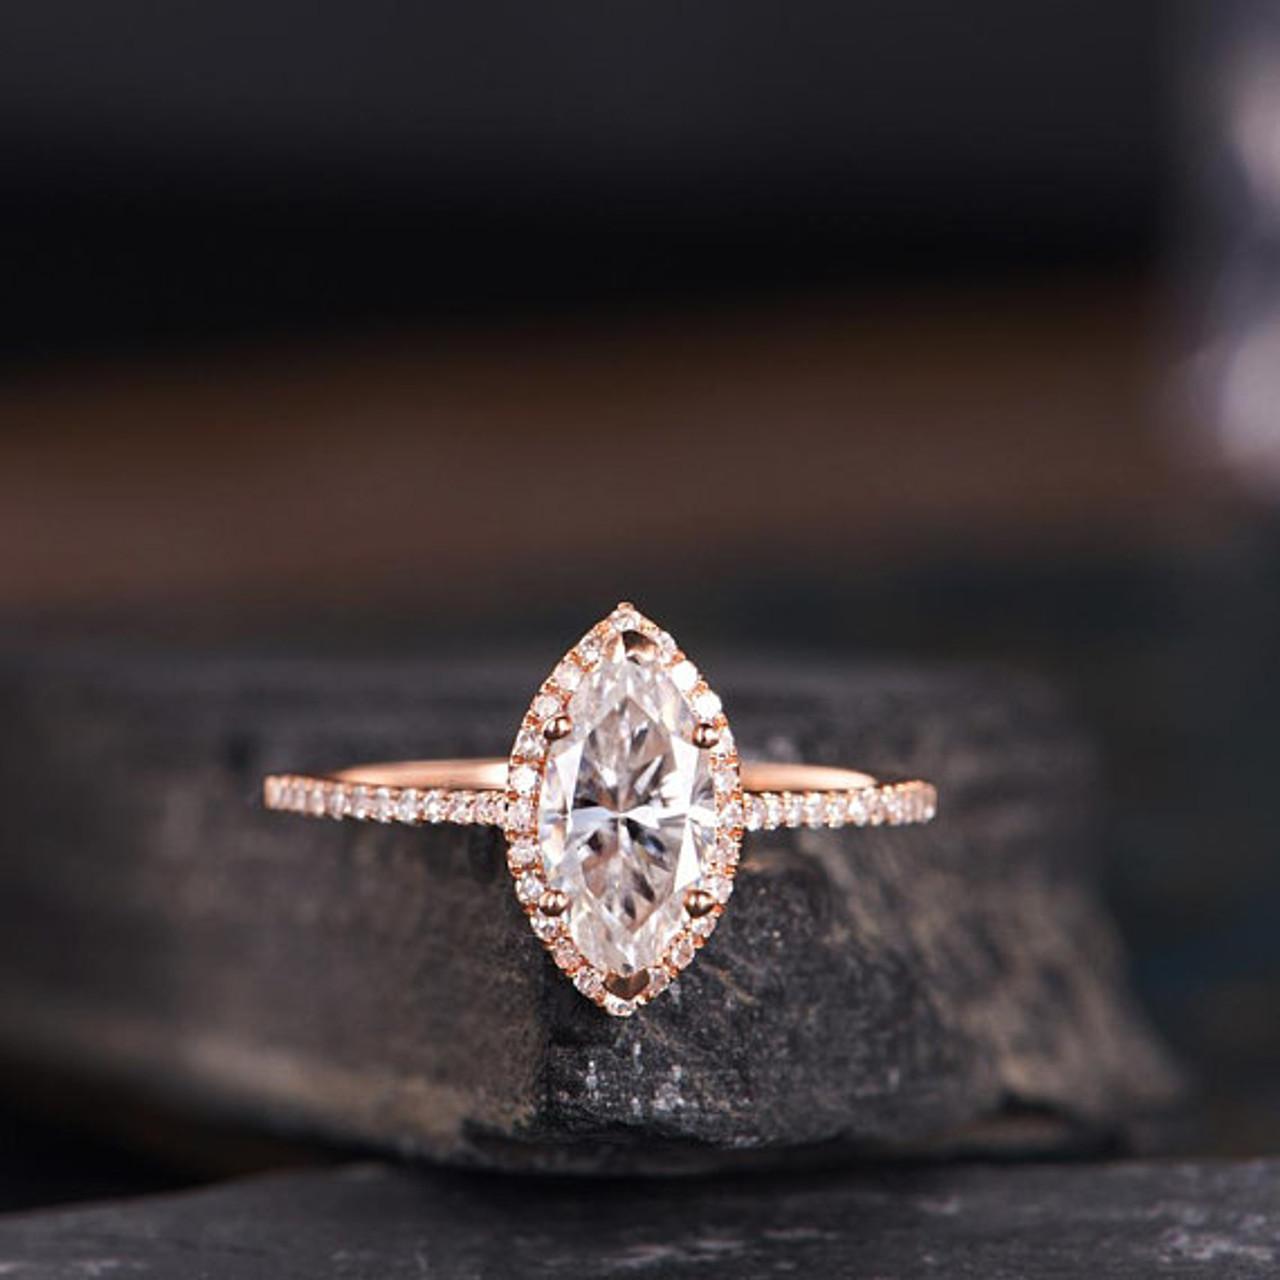 Rose Gold Moissanite Engagement Ring Marquise Shaped Bridal Wedding